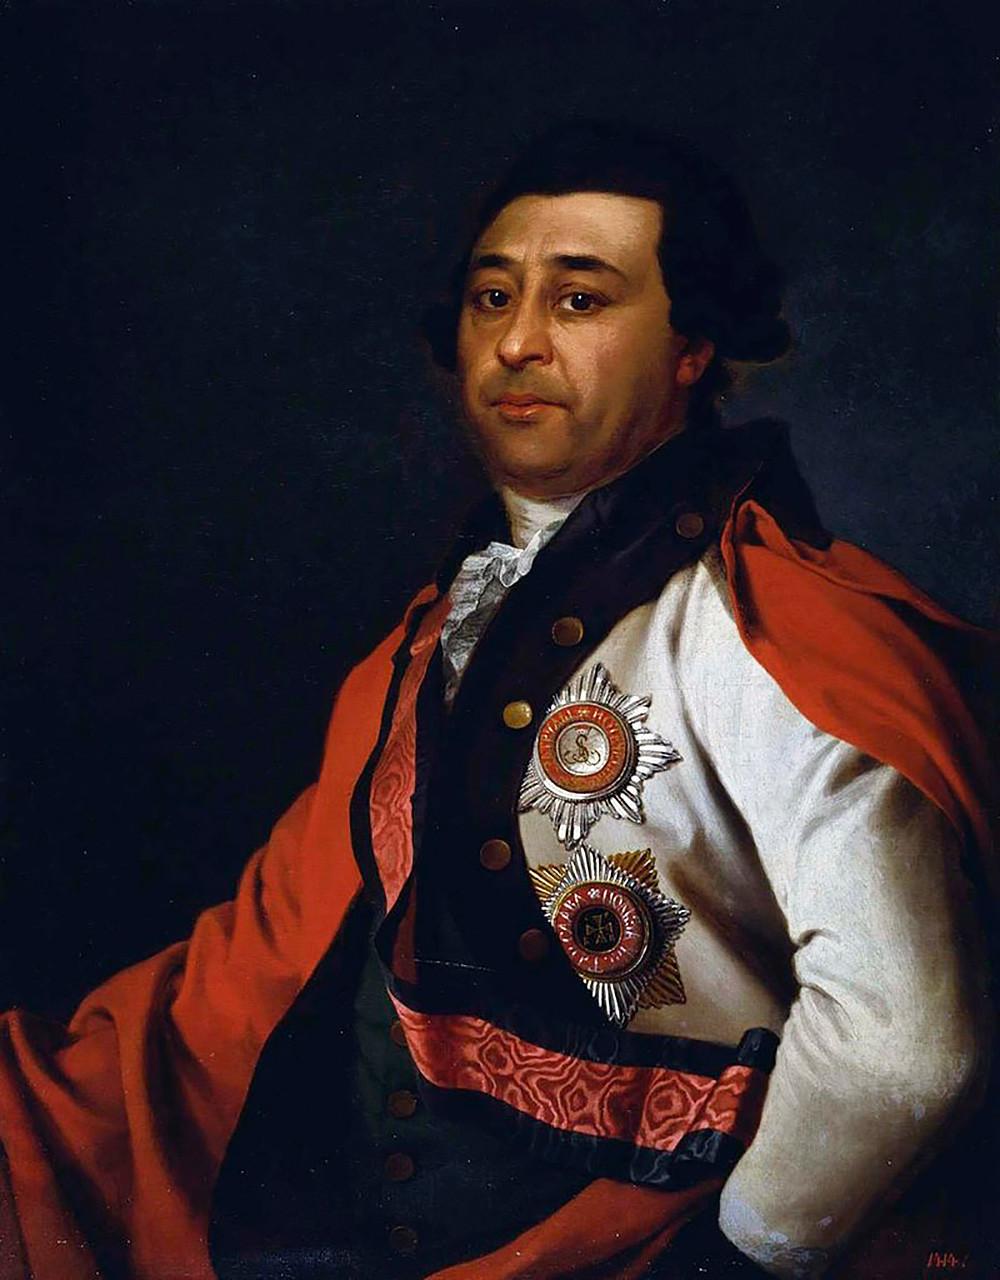 Abraham Hannibal